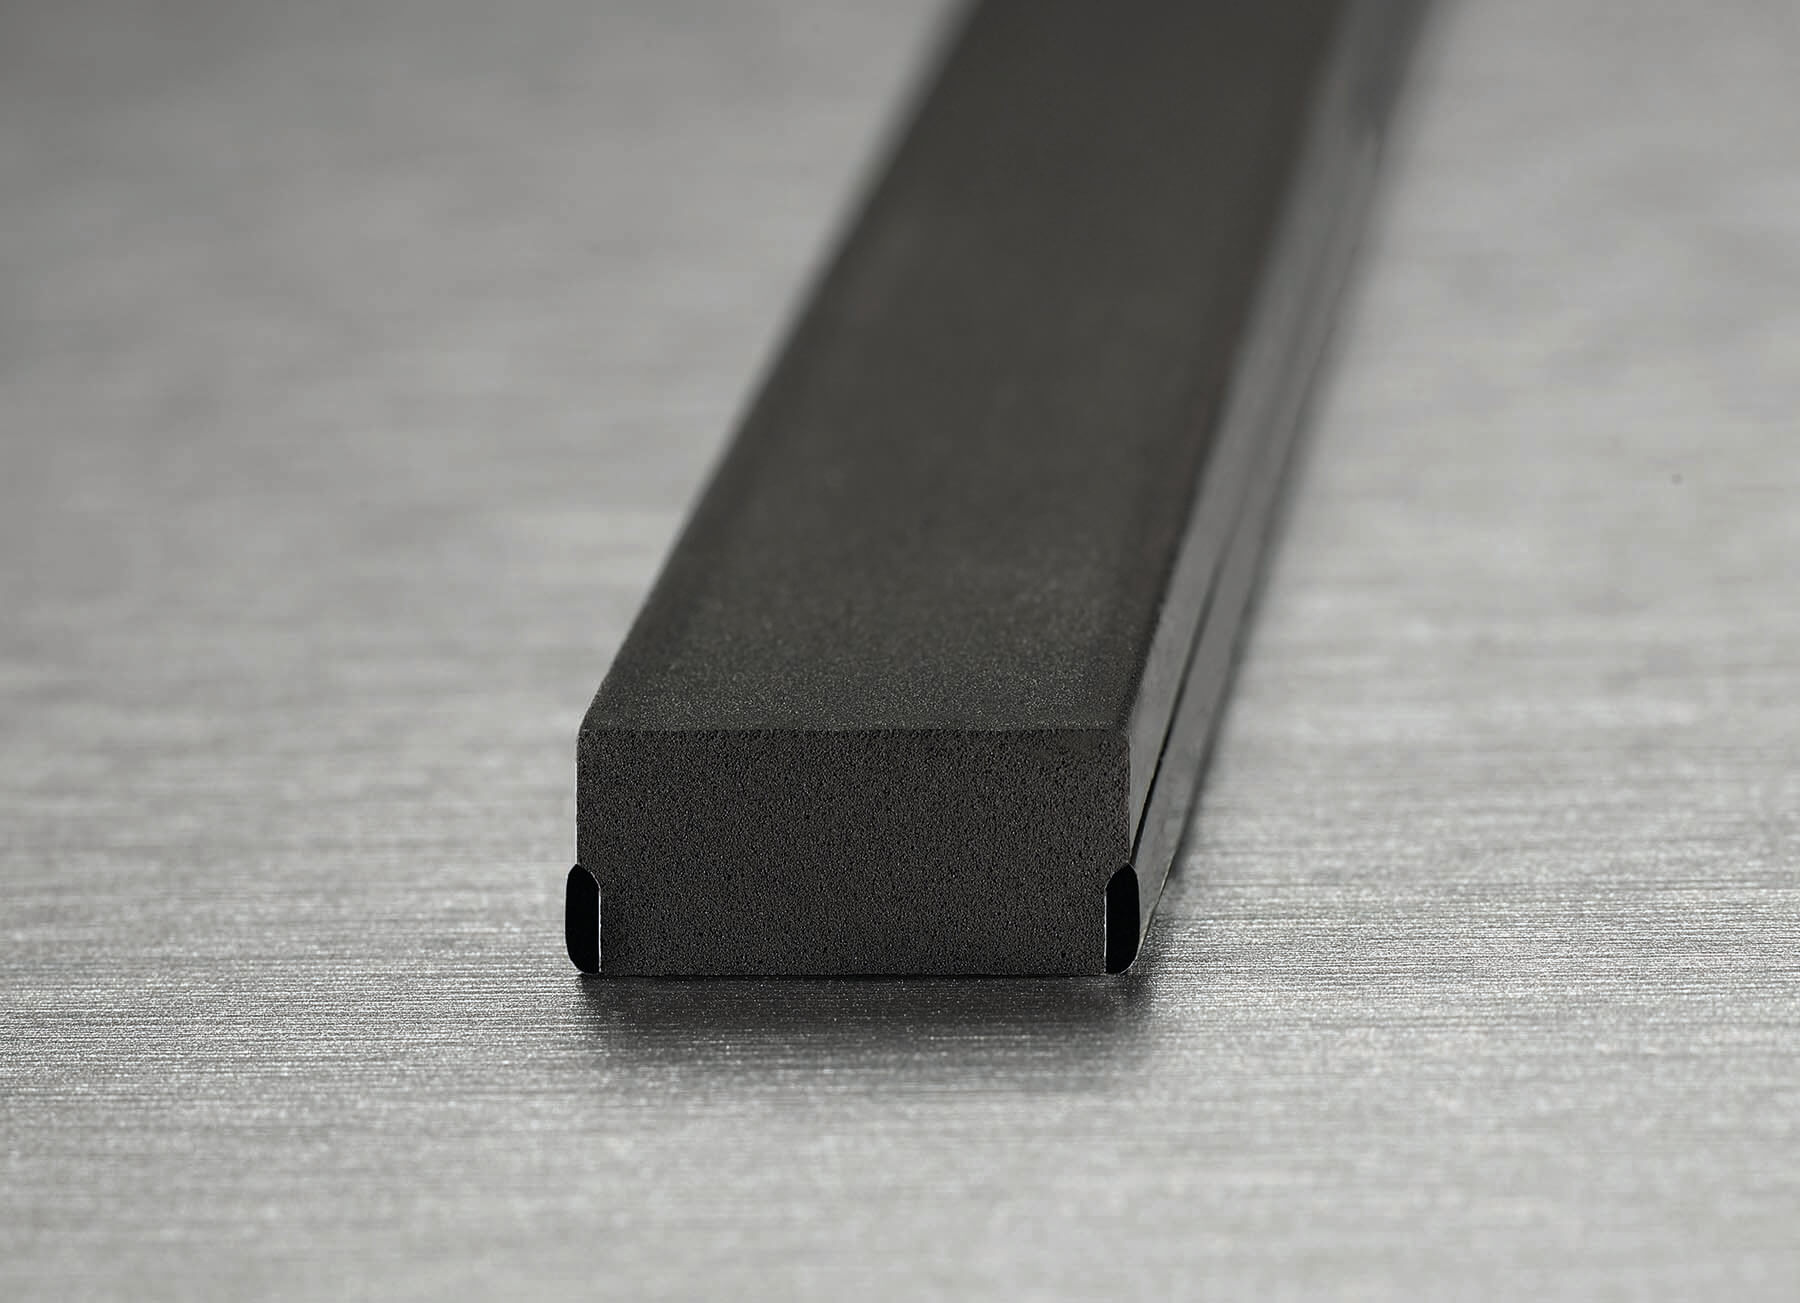 spacer bar